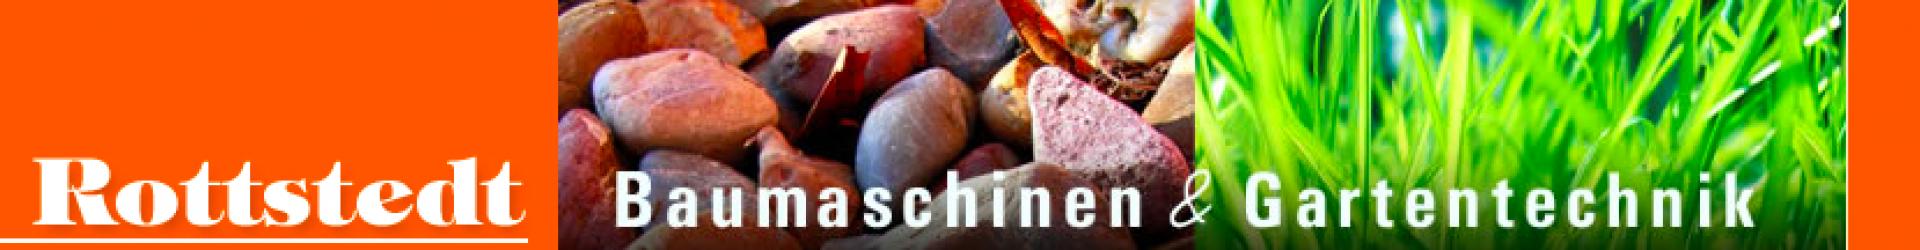 Rottstedt Baumaschinen & Gartentechnik